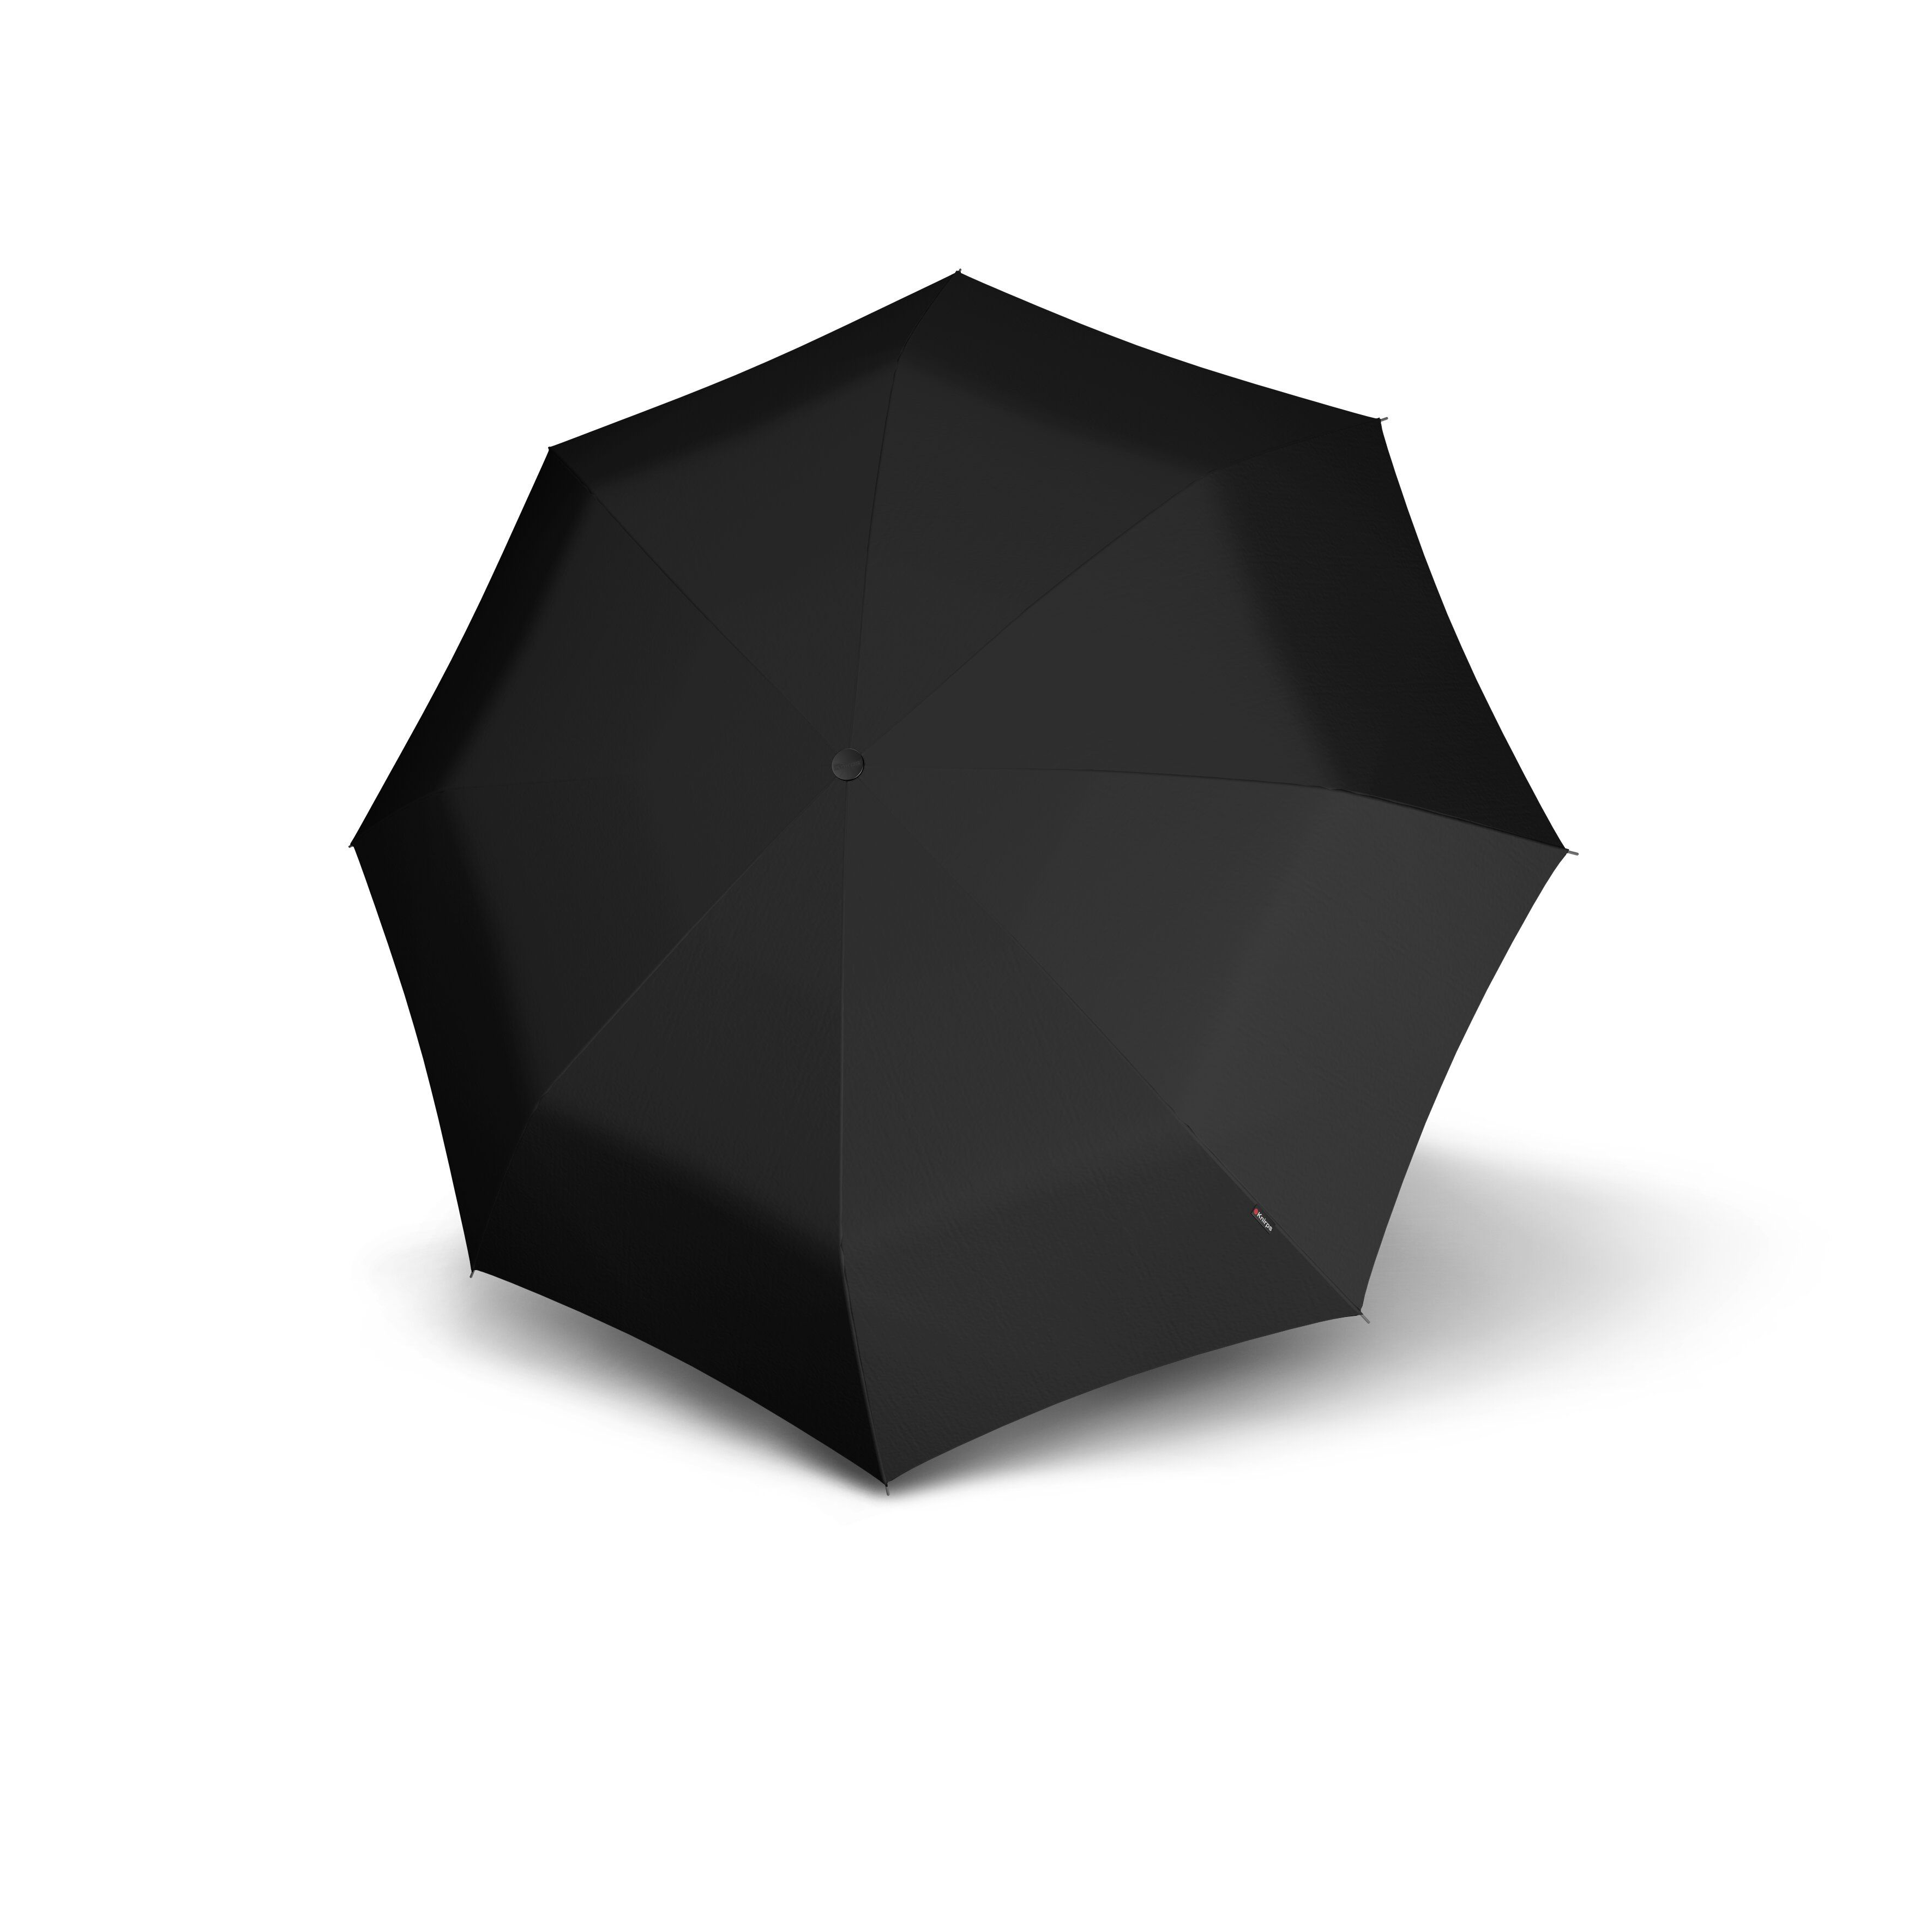 Knirps Umbrella T.900 extra long automatic - foto 2